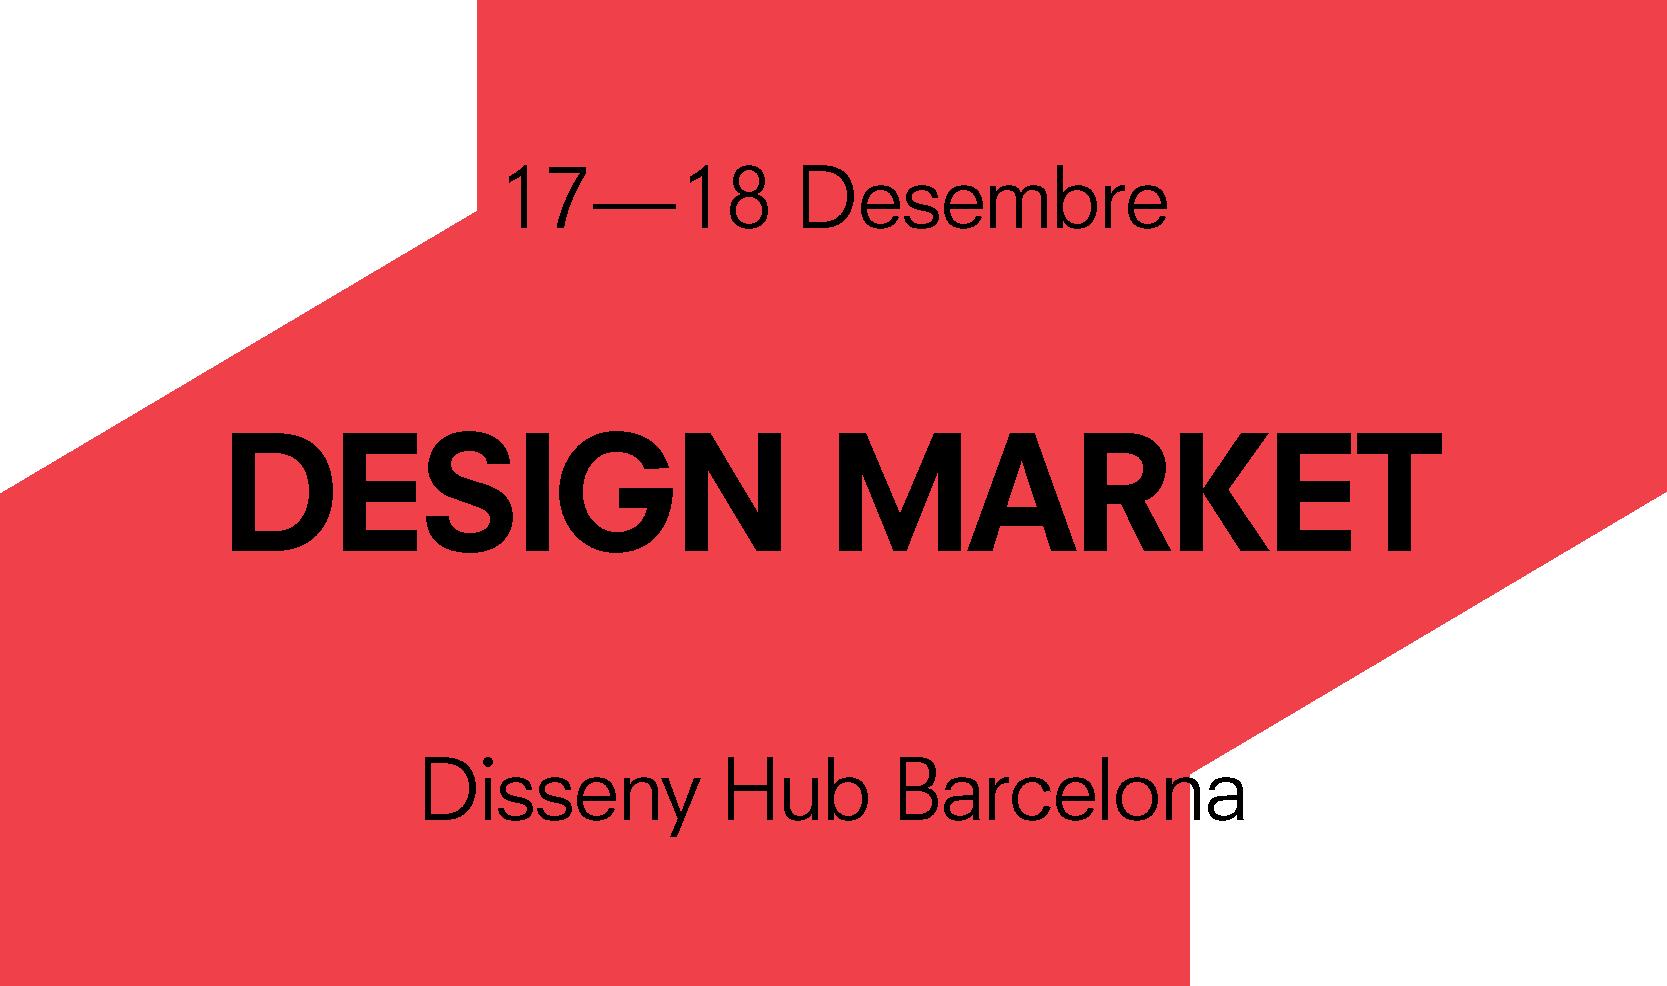 Design Market